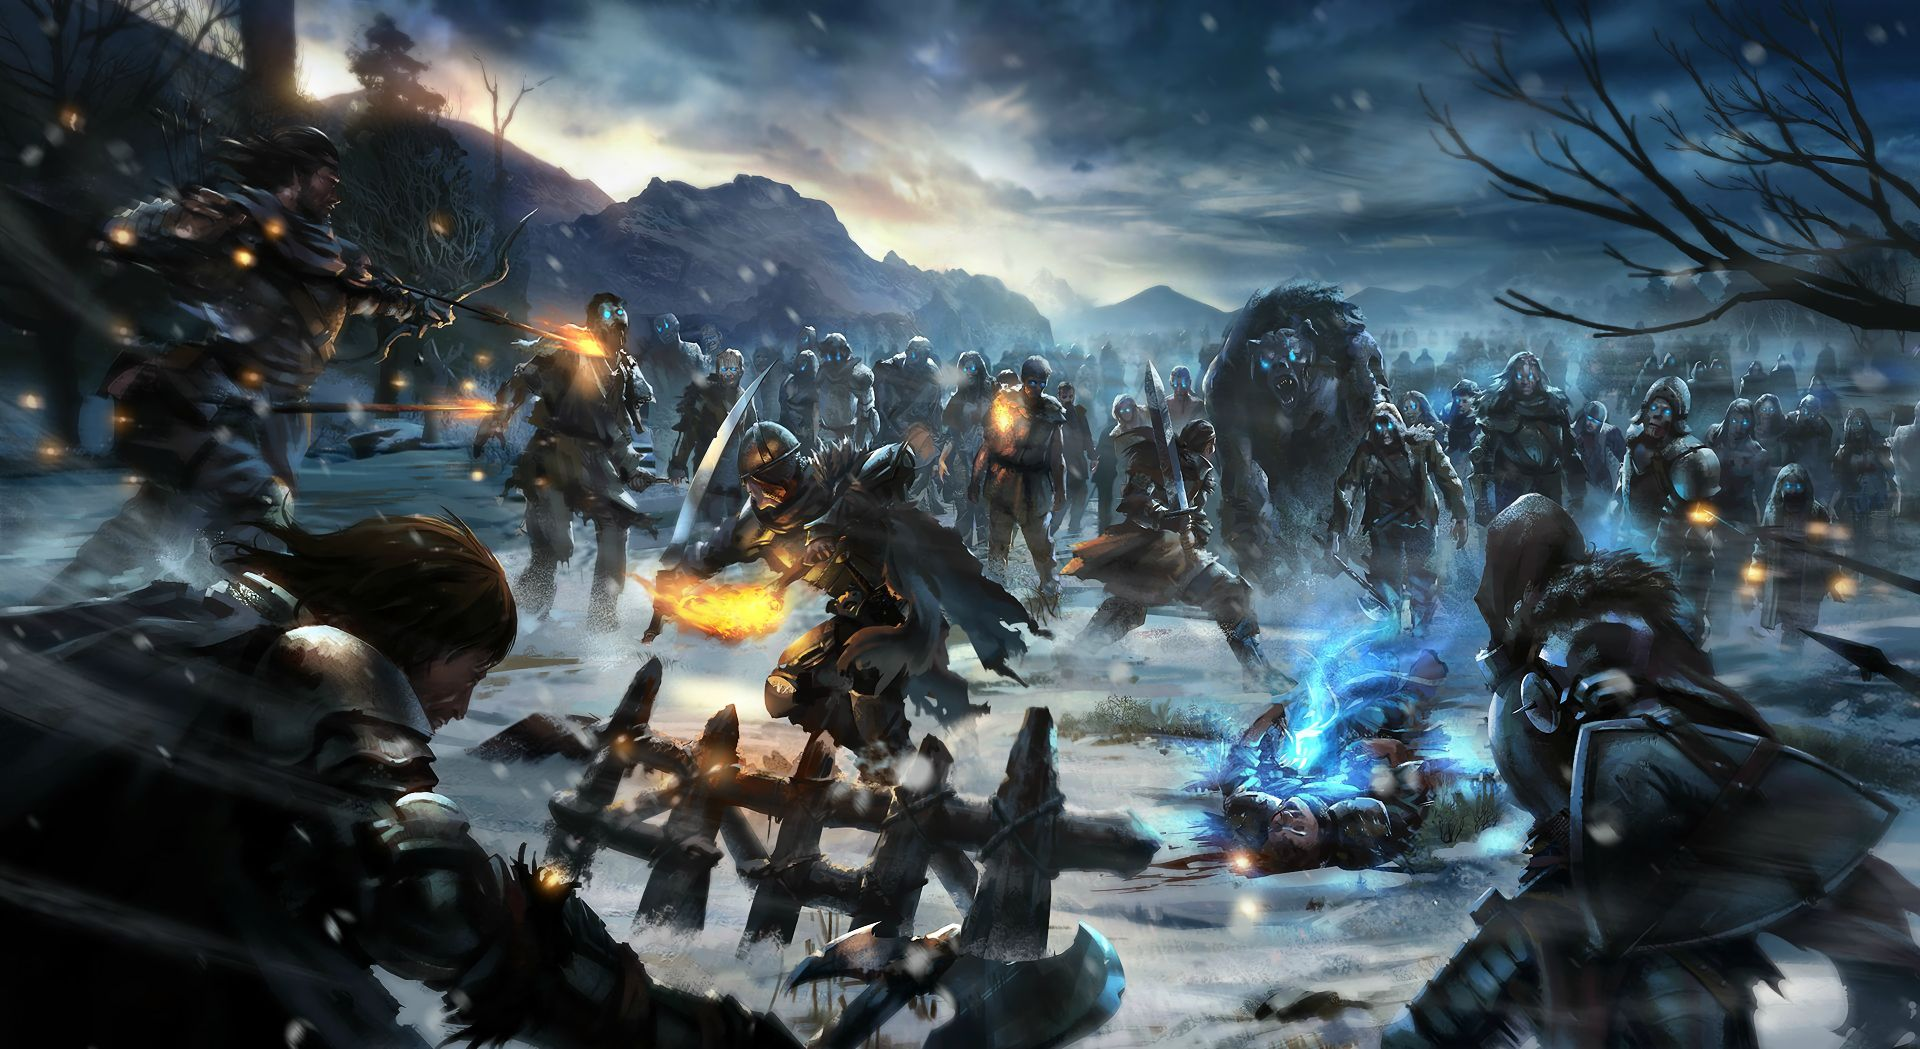 Game of Thrones art full hd wallpaper